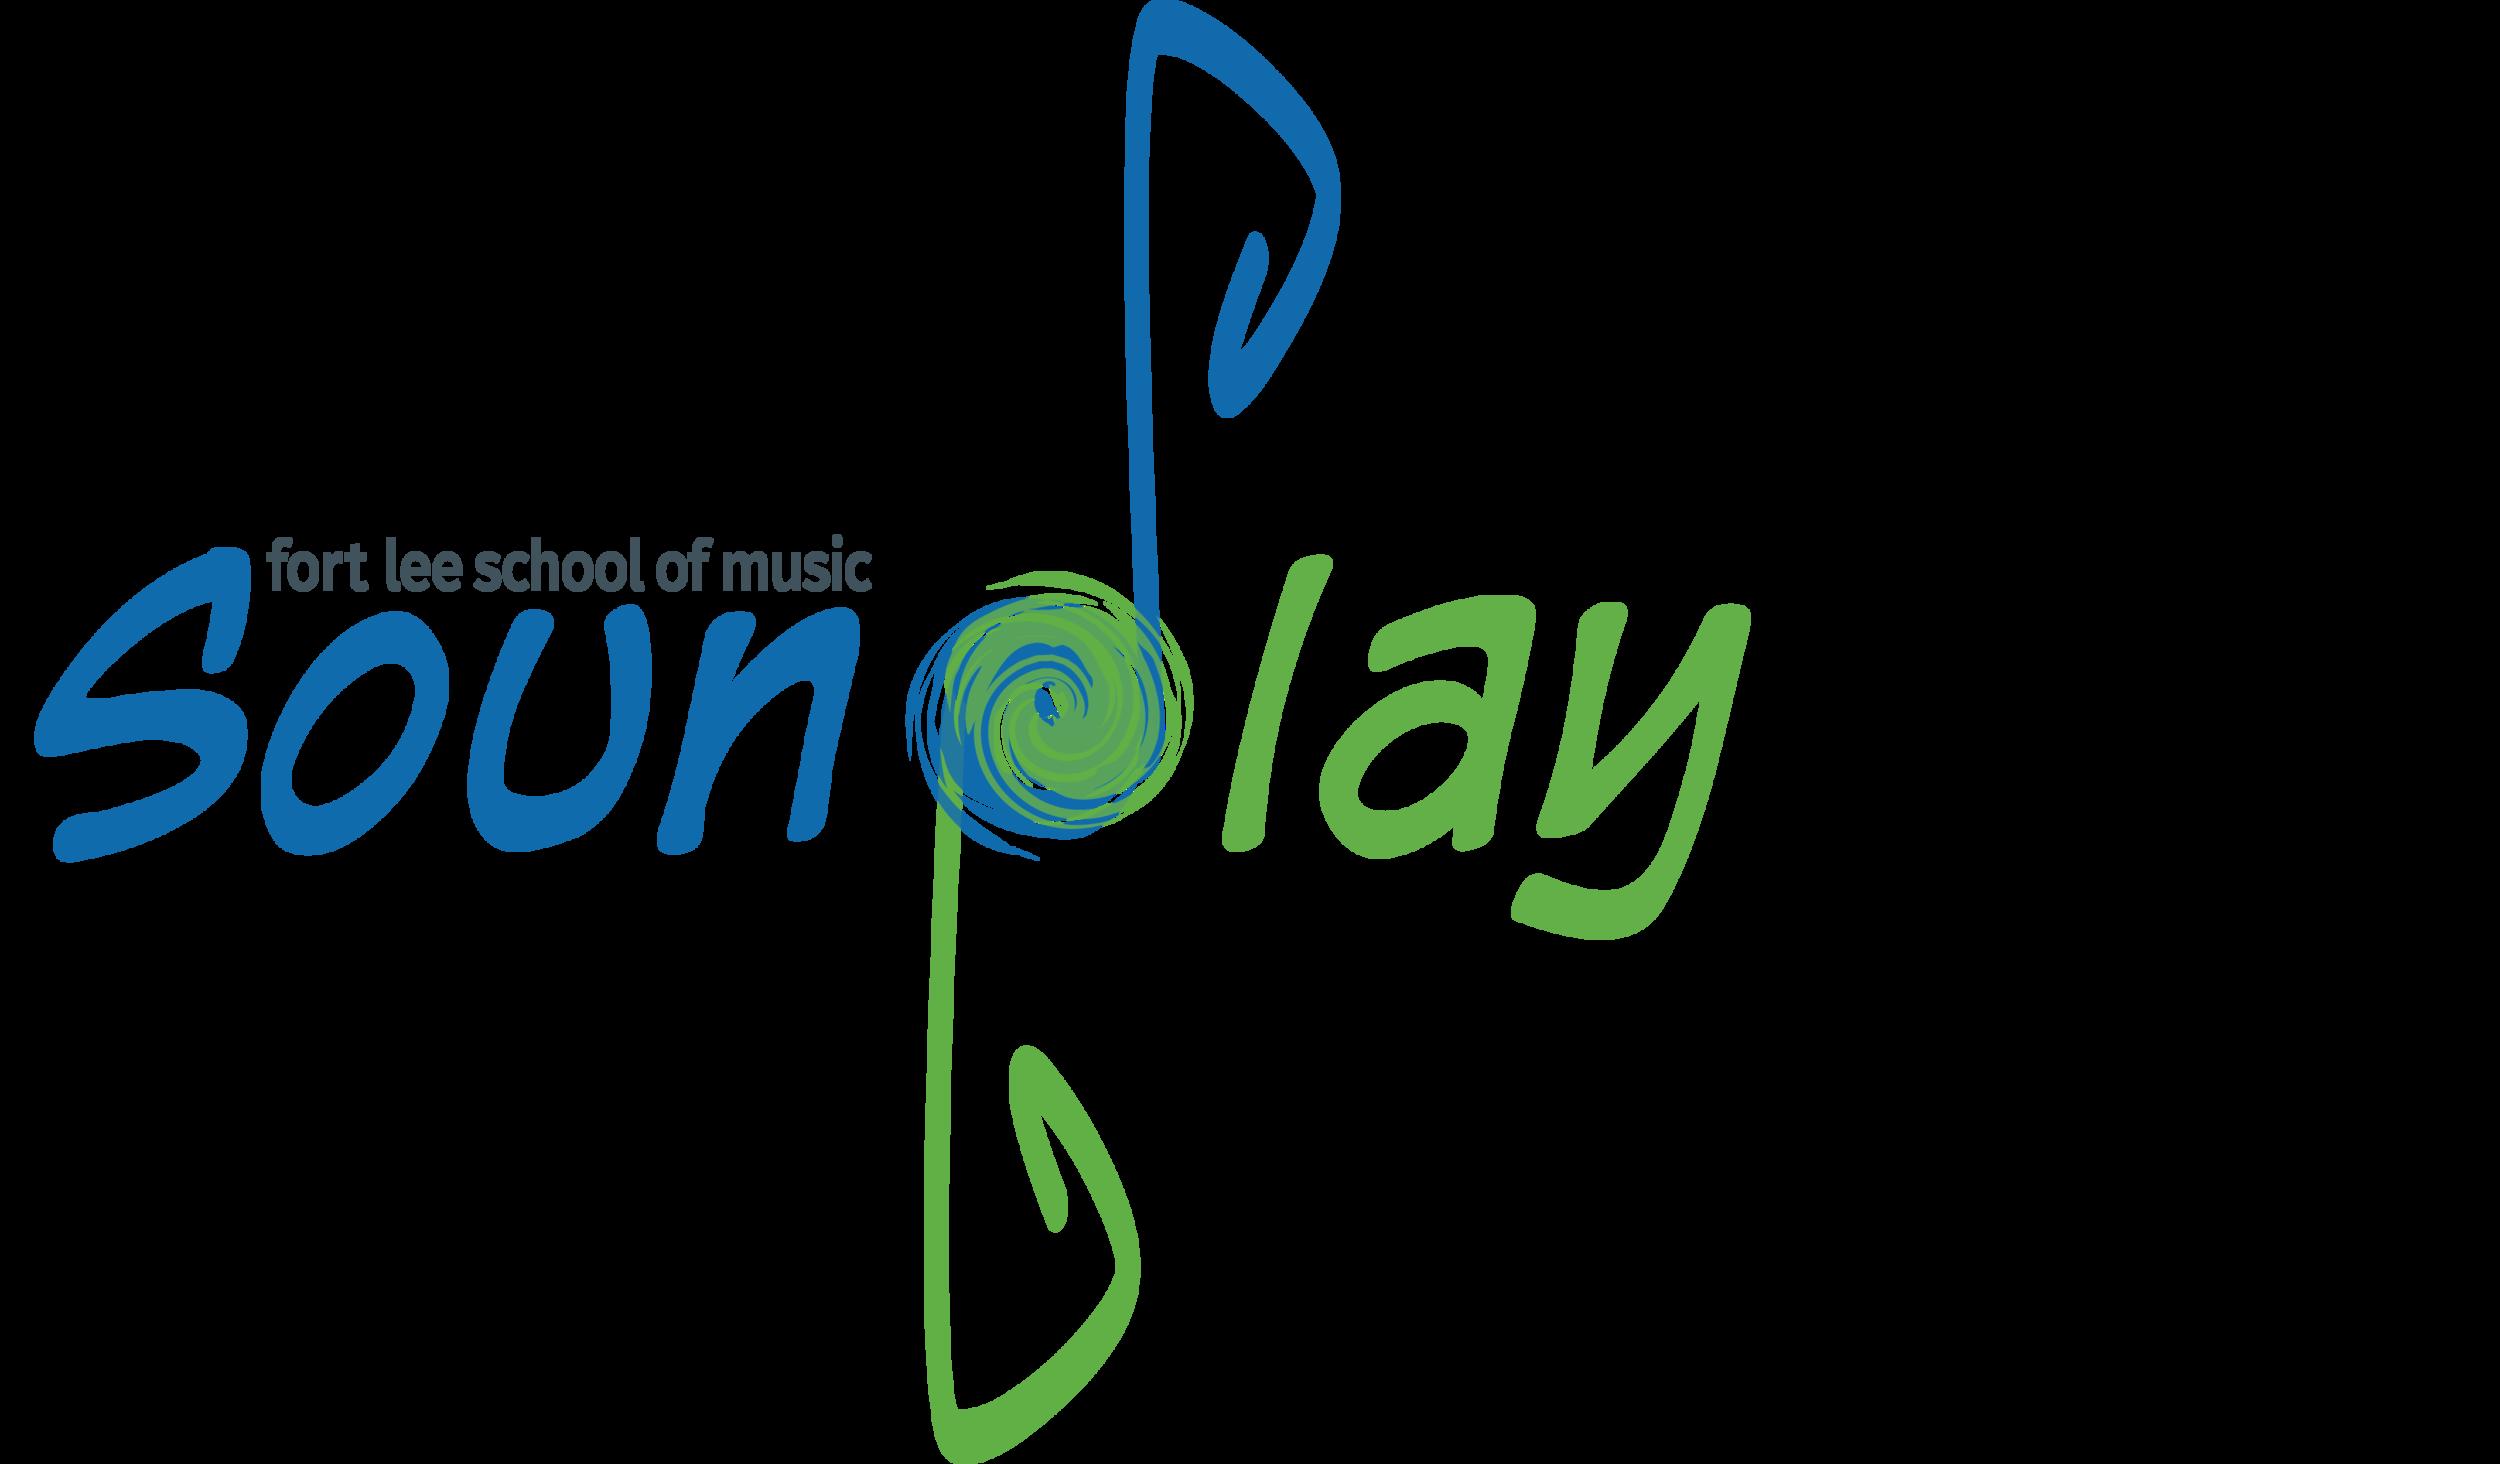 soundPlay-concert-series-fort-lee.png